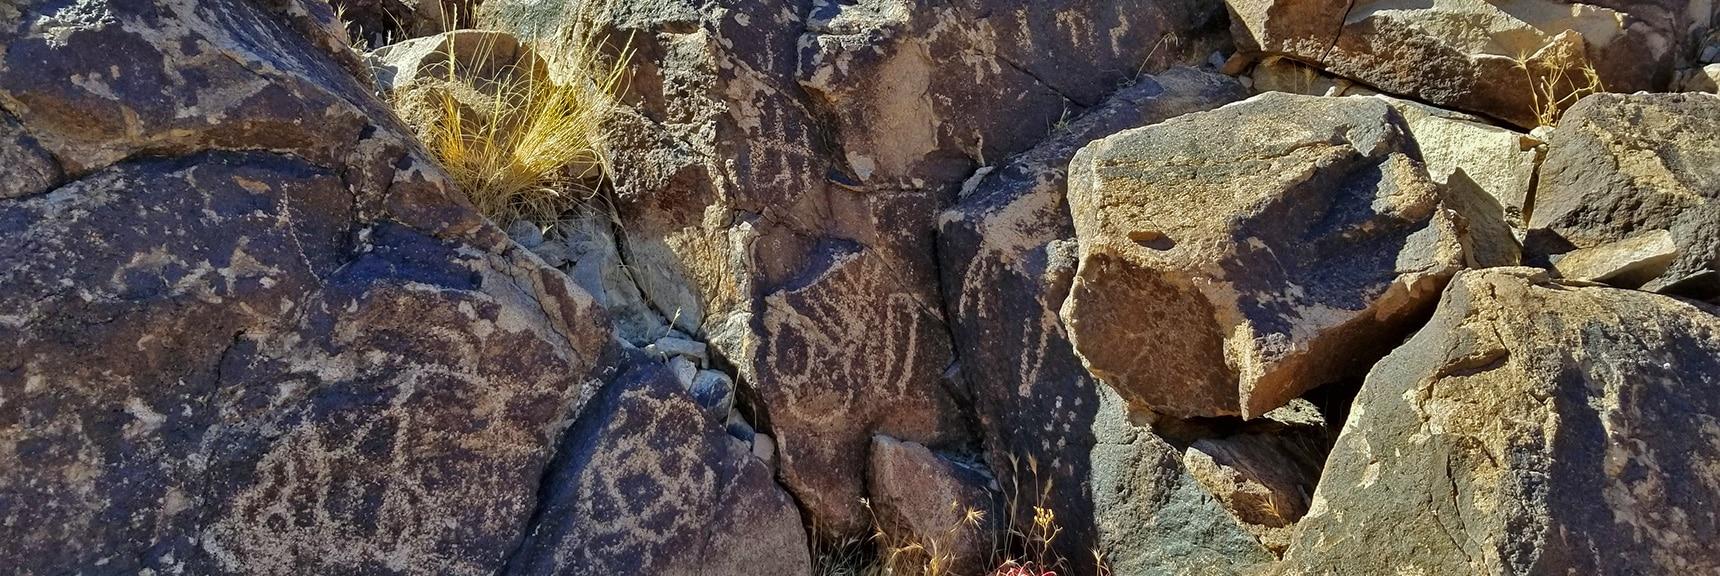 | Petroglyph Canyon | Sloan Canyon National Conservation Area, Nevada